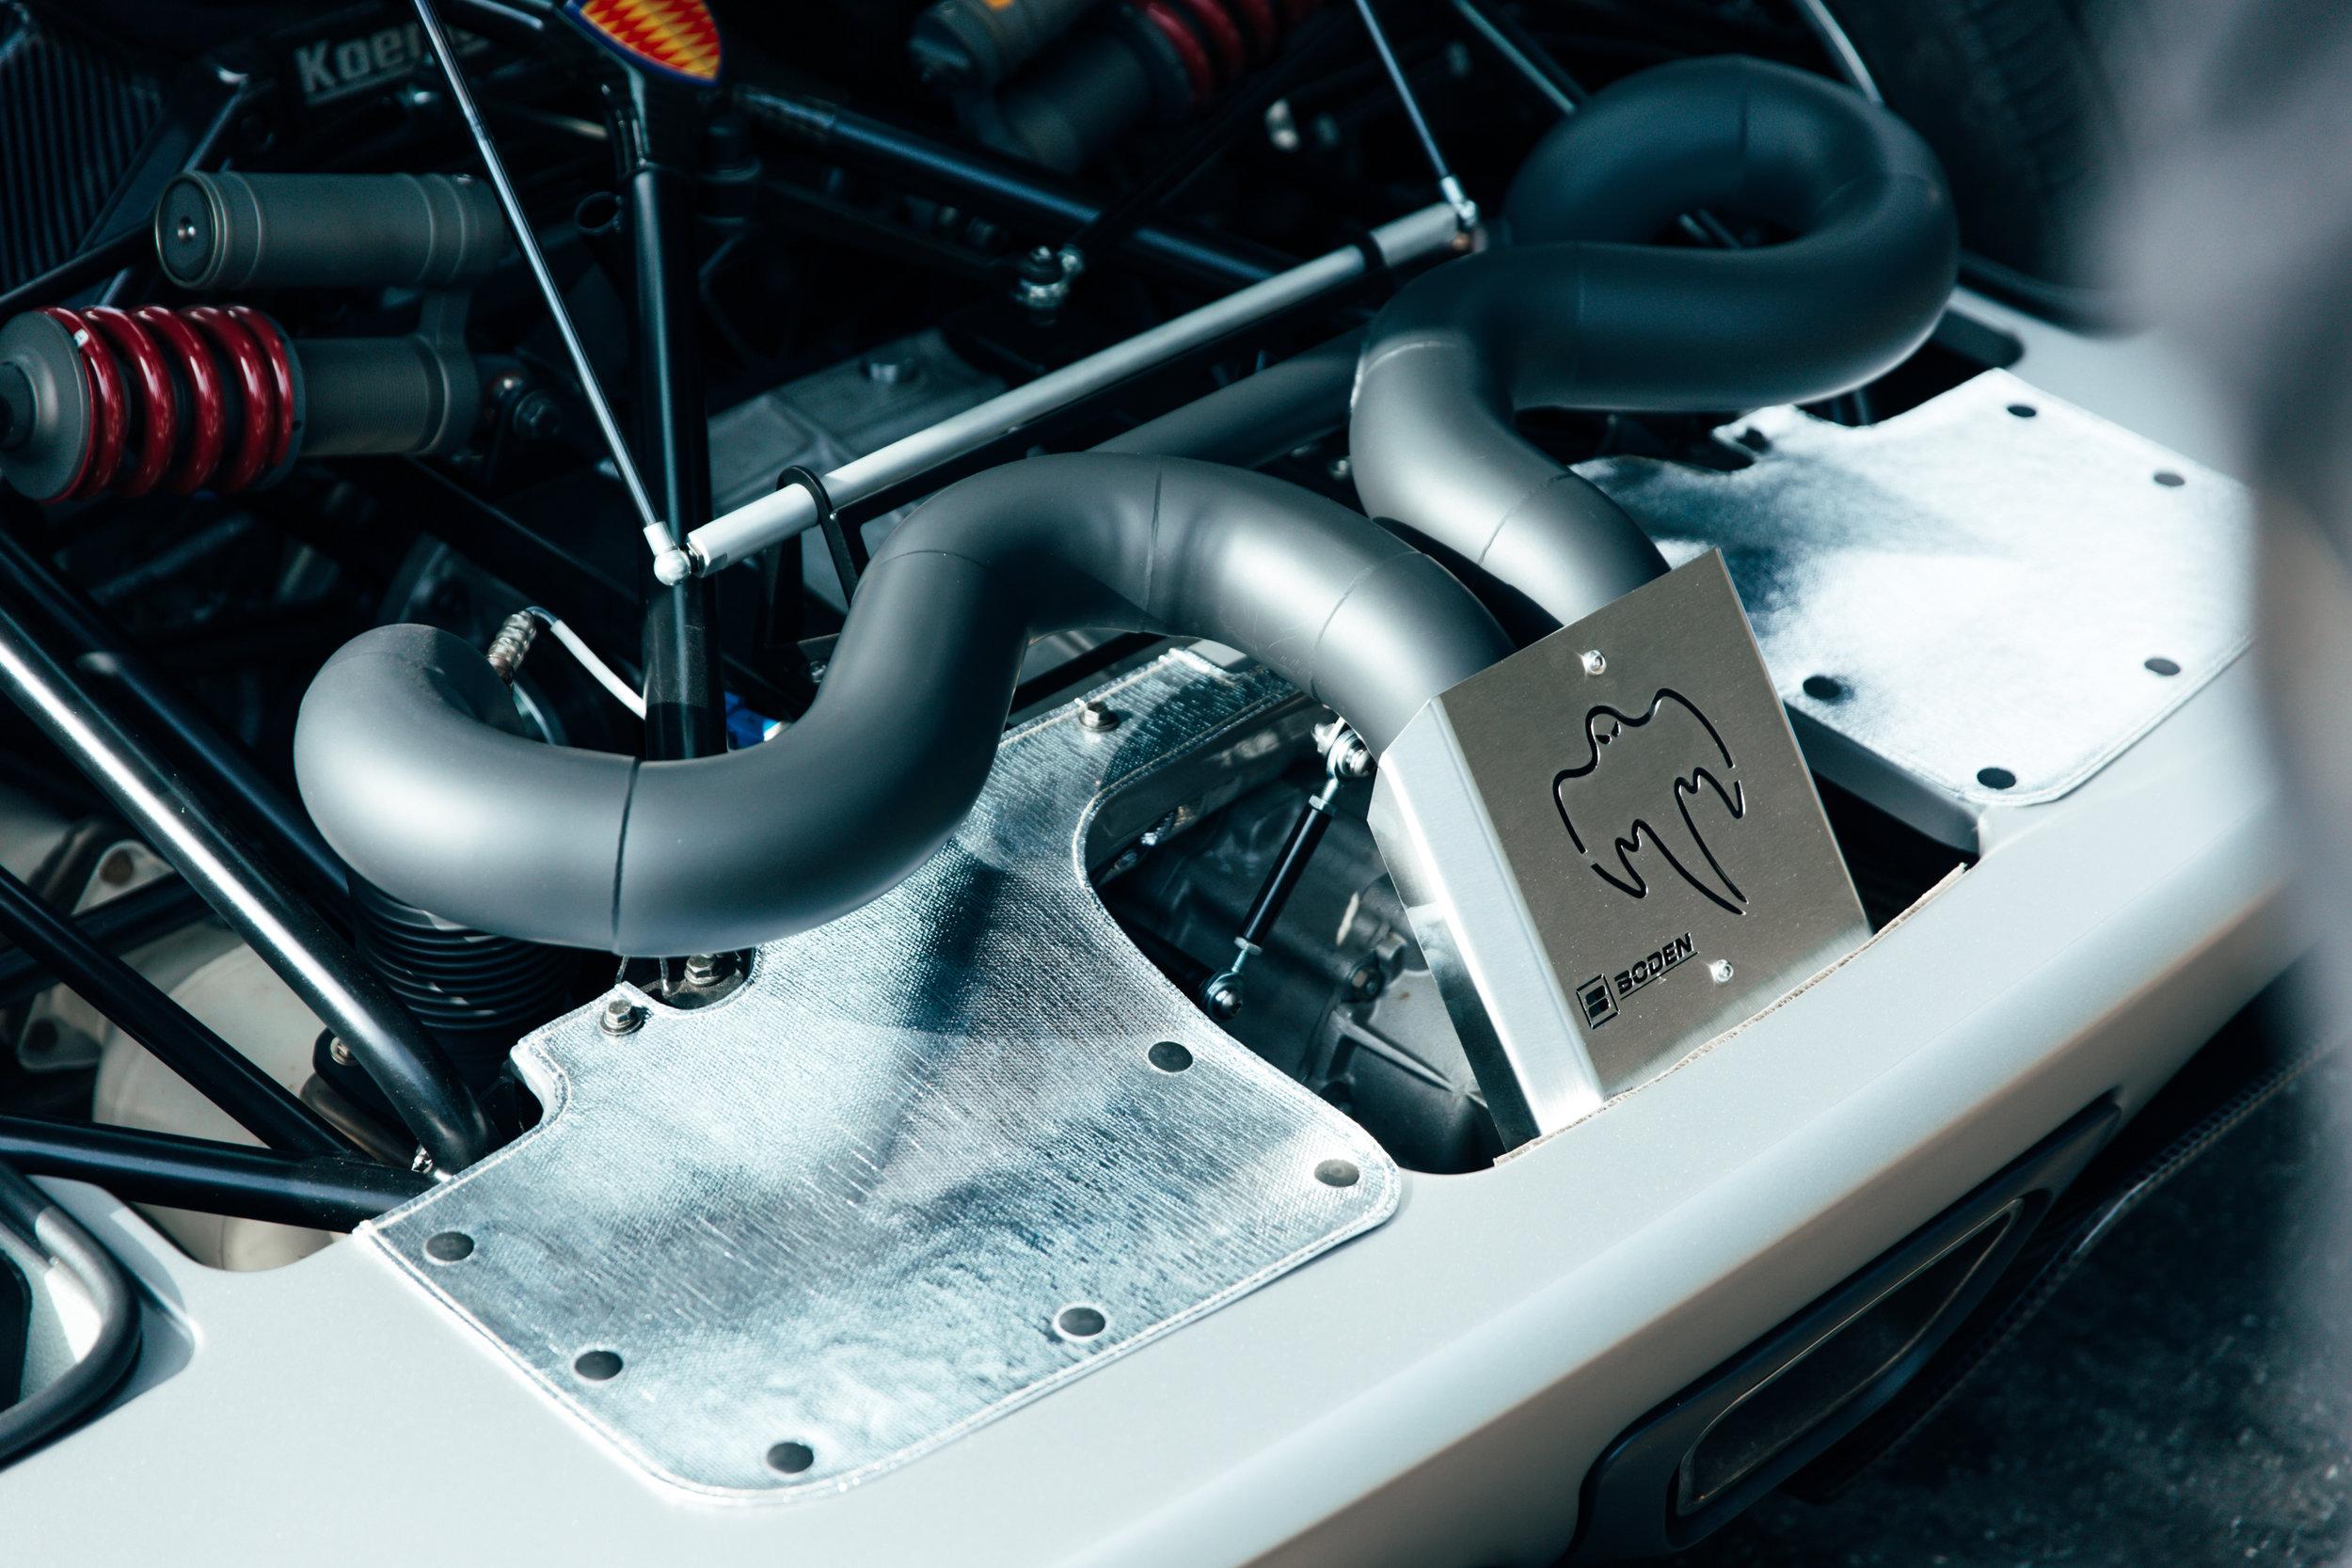 Stay_Driven_Monterey_Car_Week_Koenigsegg-3.jpg